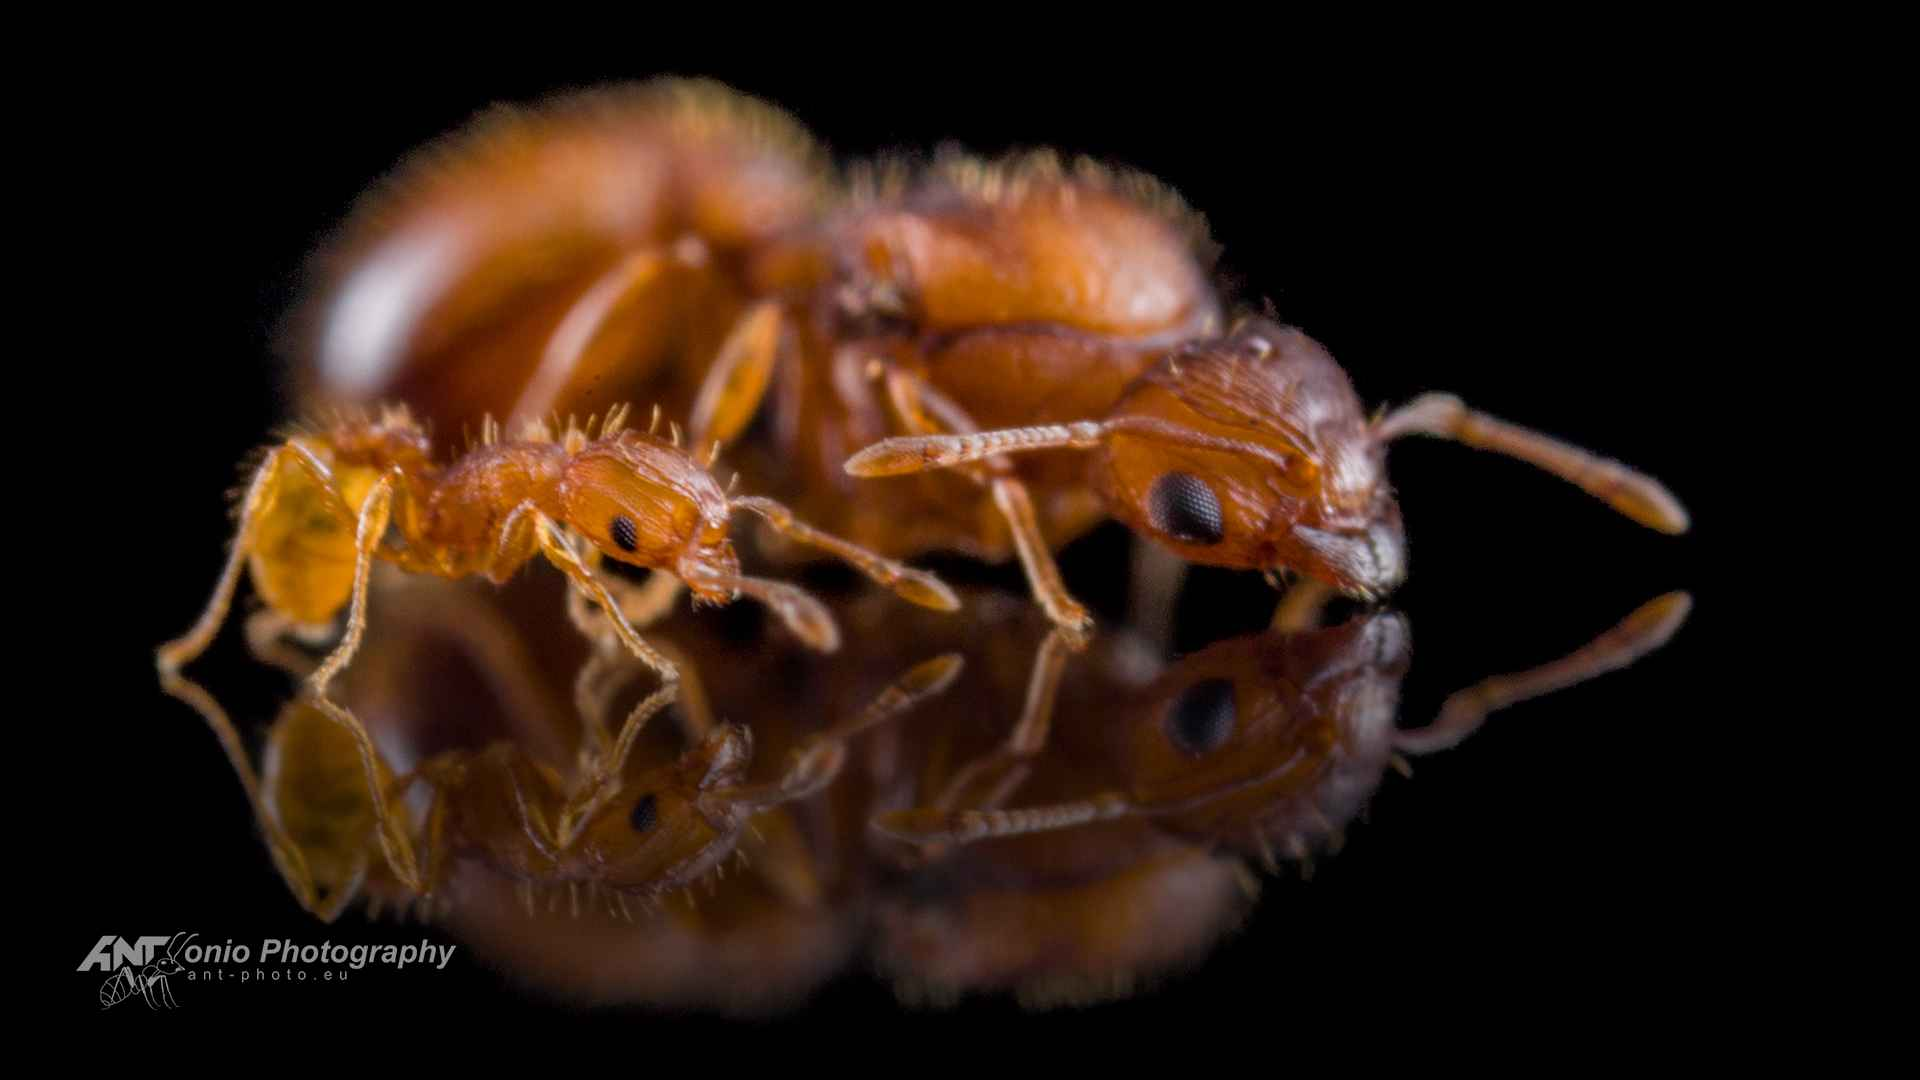 Wasmannia auropunctata queen